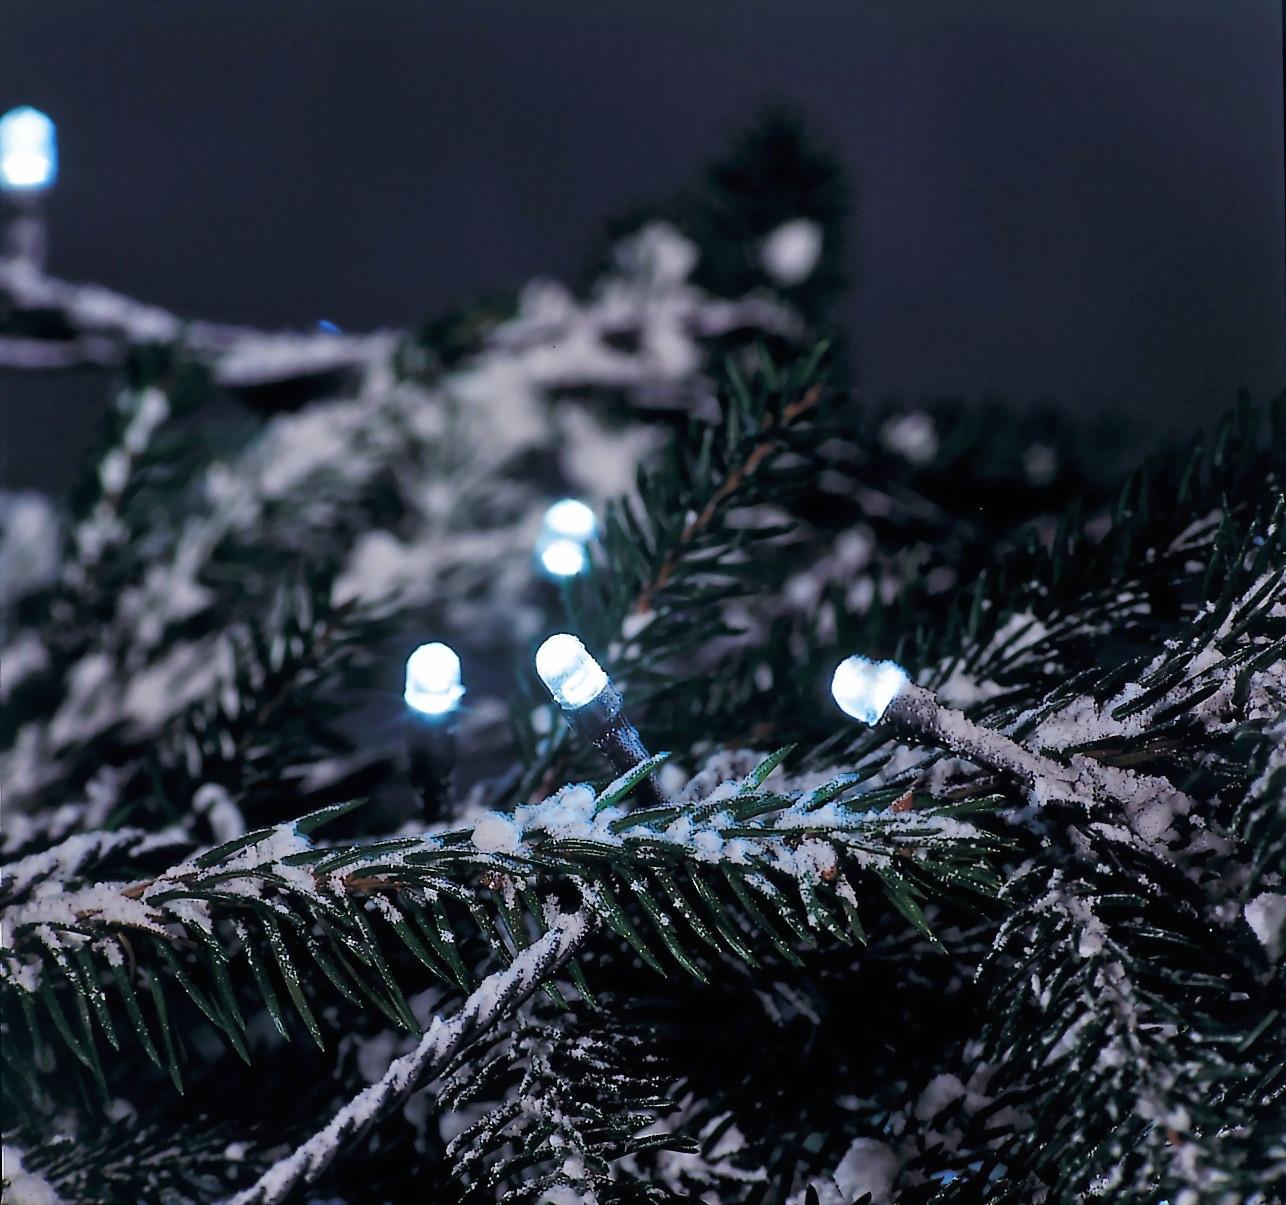 led christbaumbeleuchtung weihnachtsbaumbeleuchtung stecksystem trango kabellose led. Black Bedroom Furniture Sets. Home Design Ideas